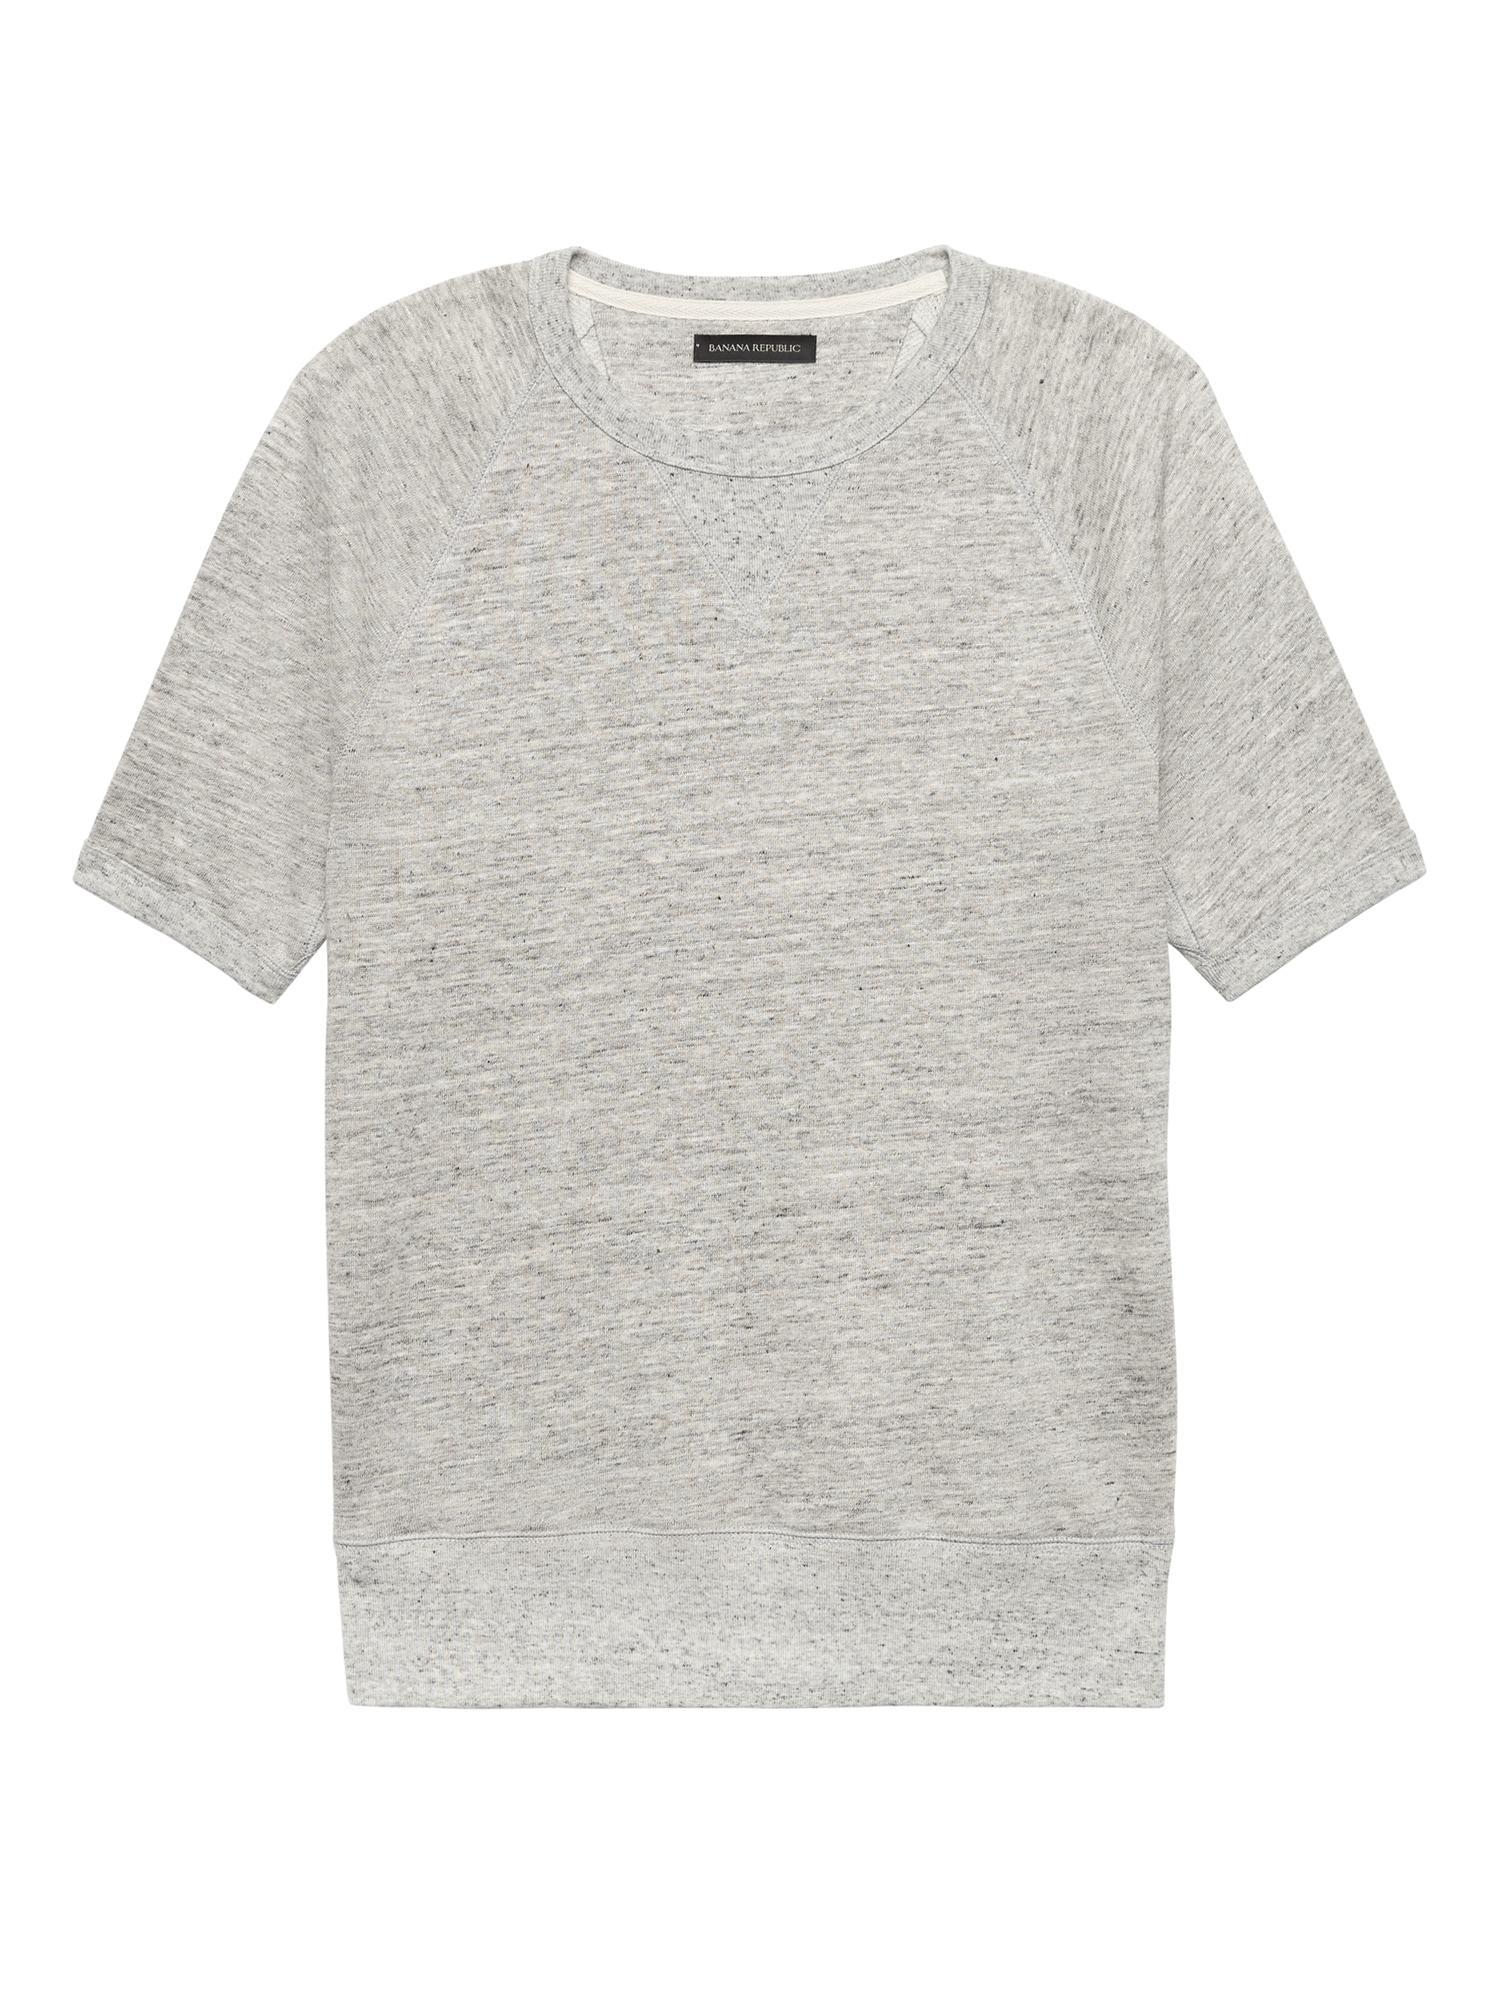 d45167e8092e76 Lyst - Banana Republic Heritage Linen-cotton French Terry Sweatshirt ...